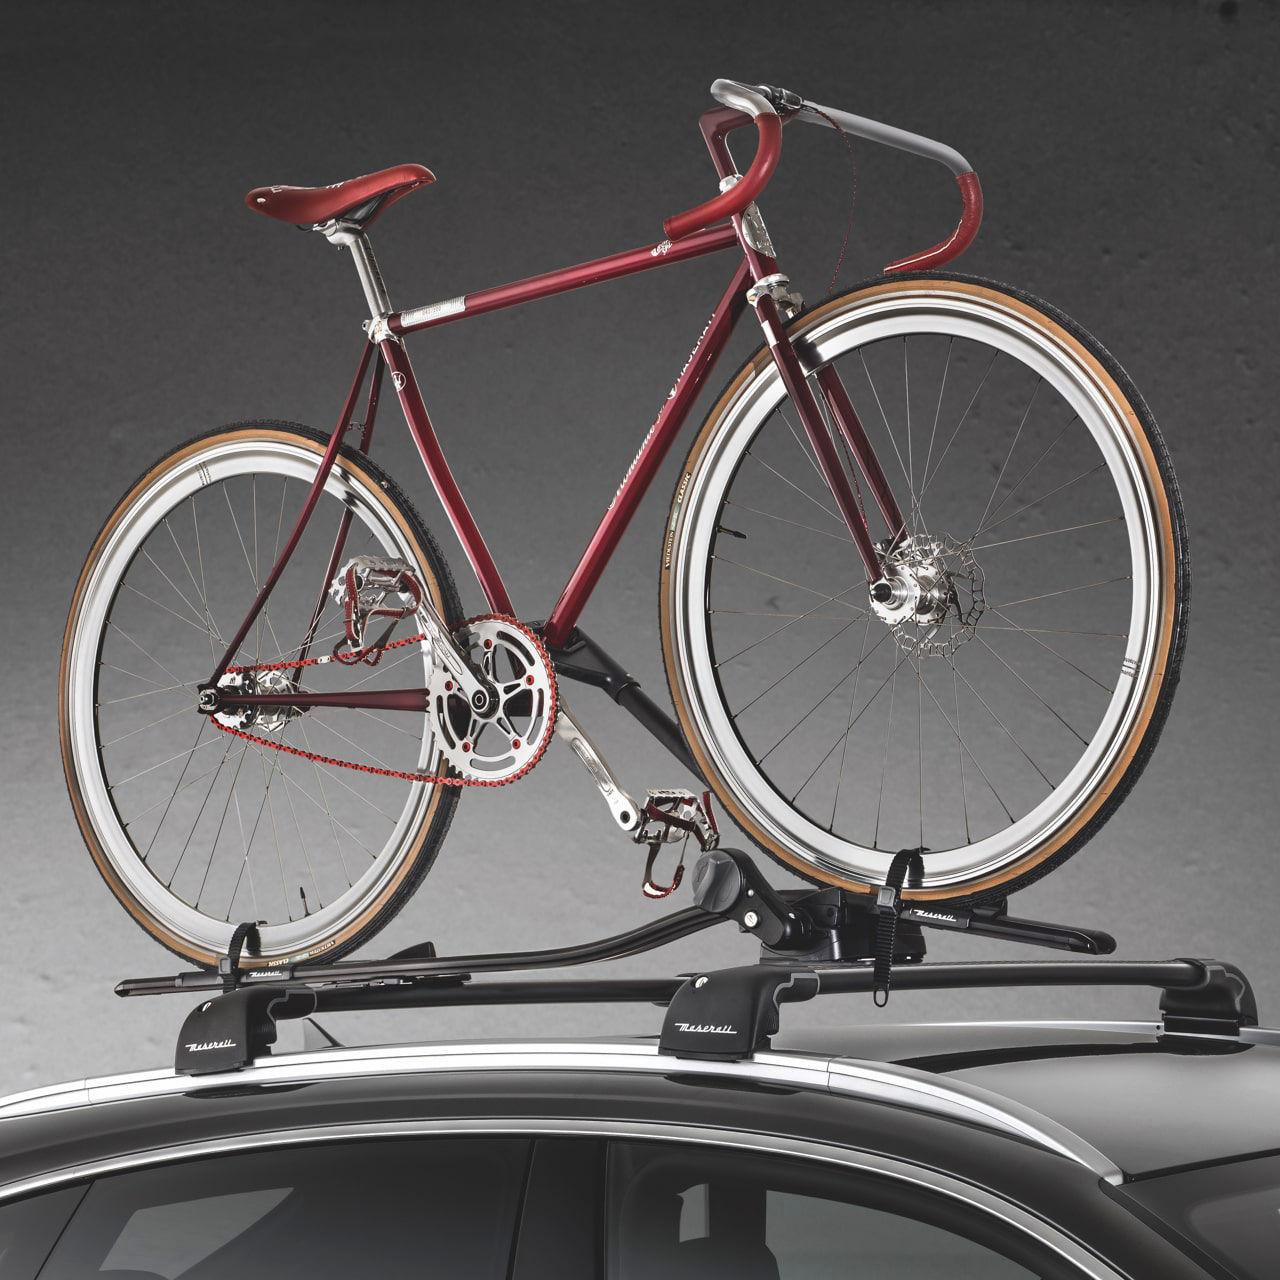 Maserati accessories and customisation -  Bike carrier Maserati Levnate